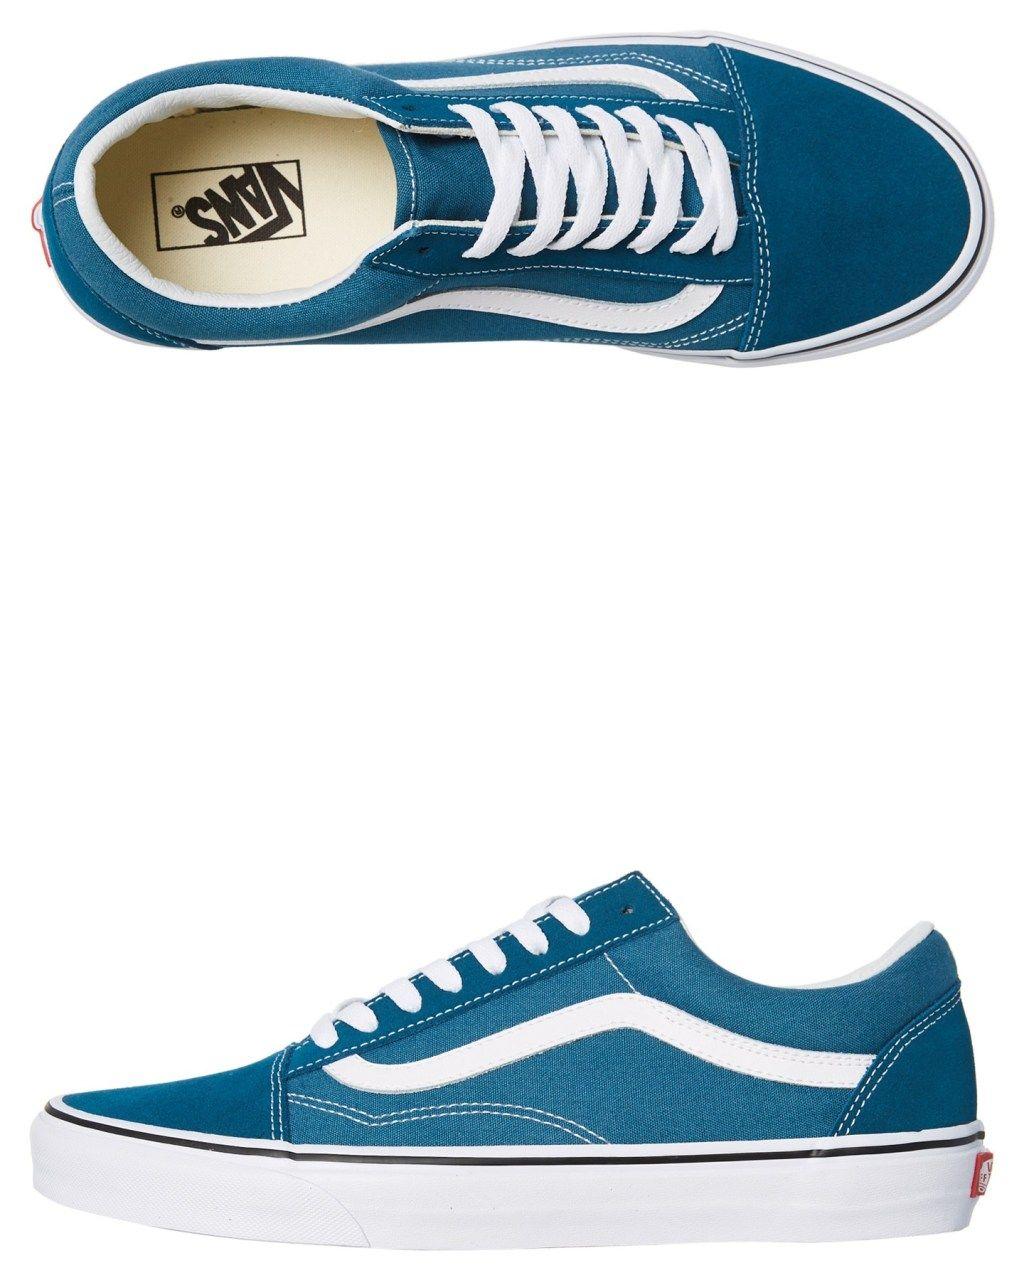 c188aac8f3 Vans Mens Old Skool Shoe Corsair White Corsair White Womens Sneakers Size 12